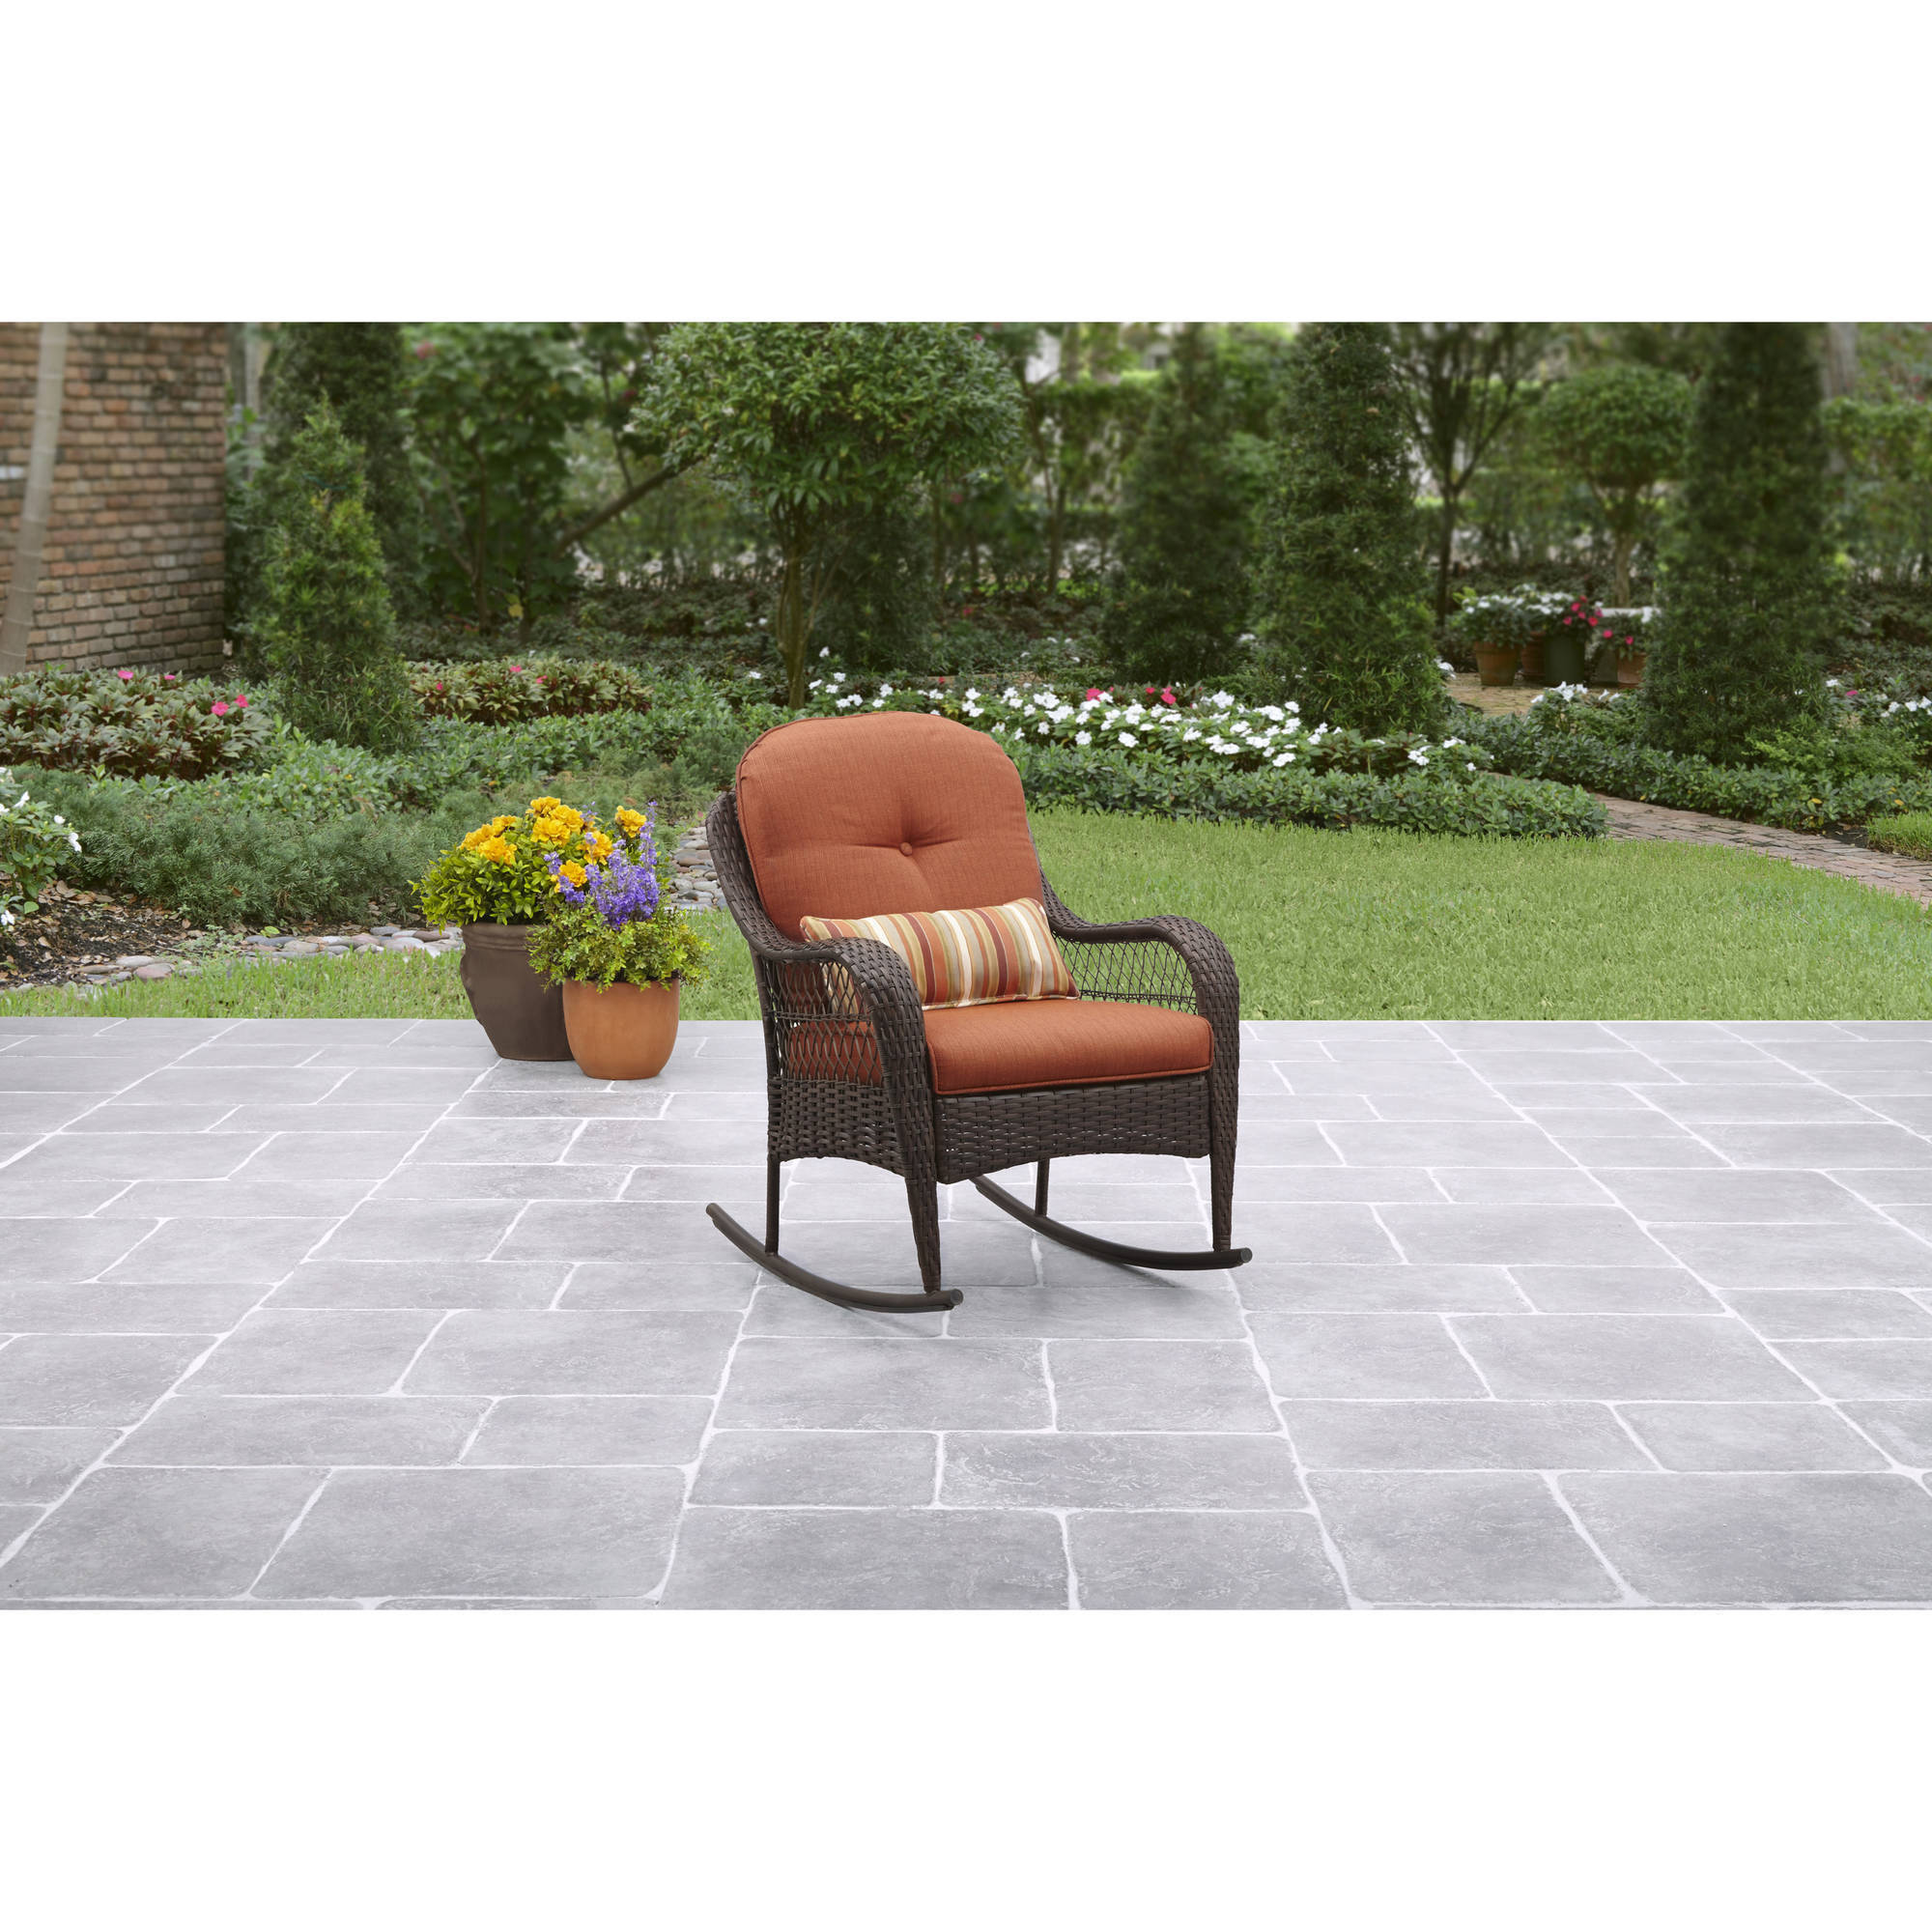 Better Homes and Gardens Azalea Ridge Outdoor Rocking Chair